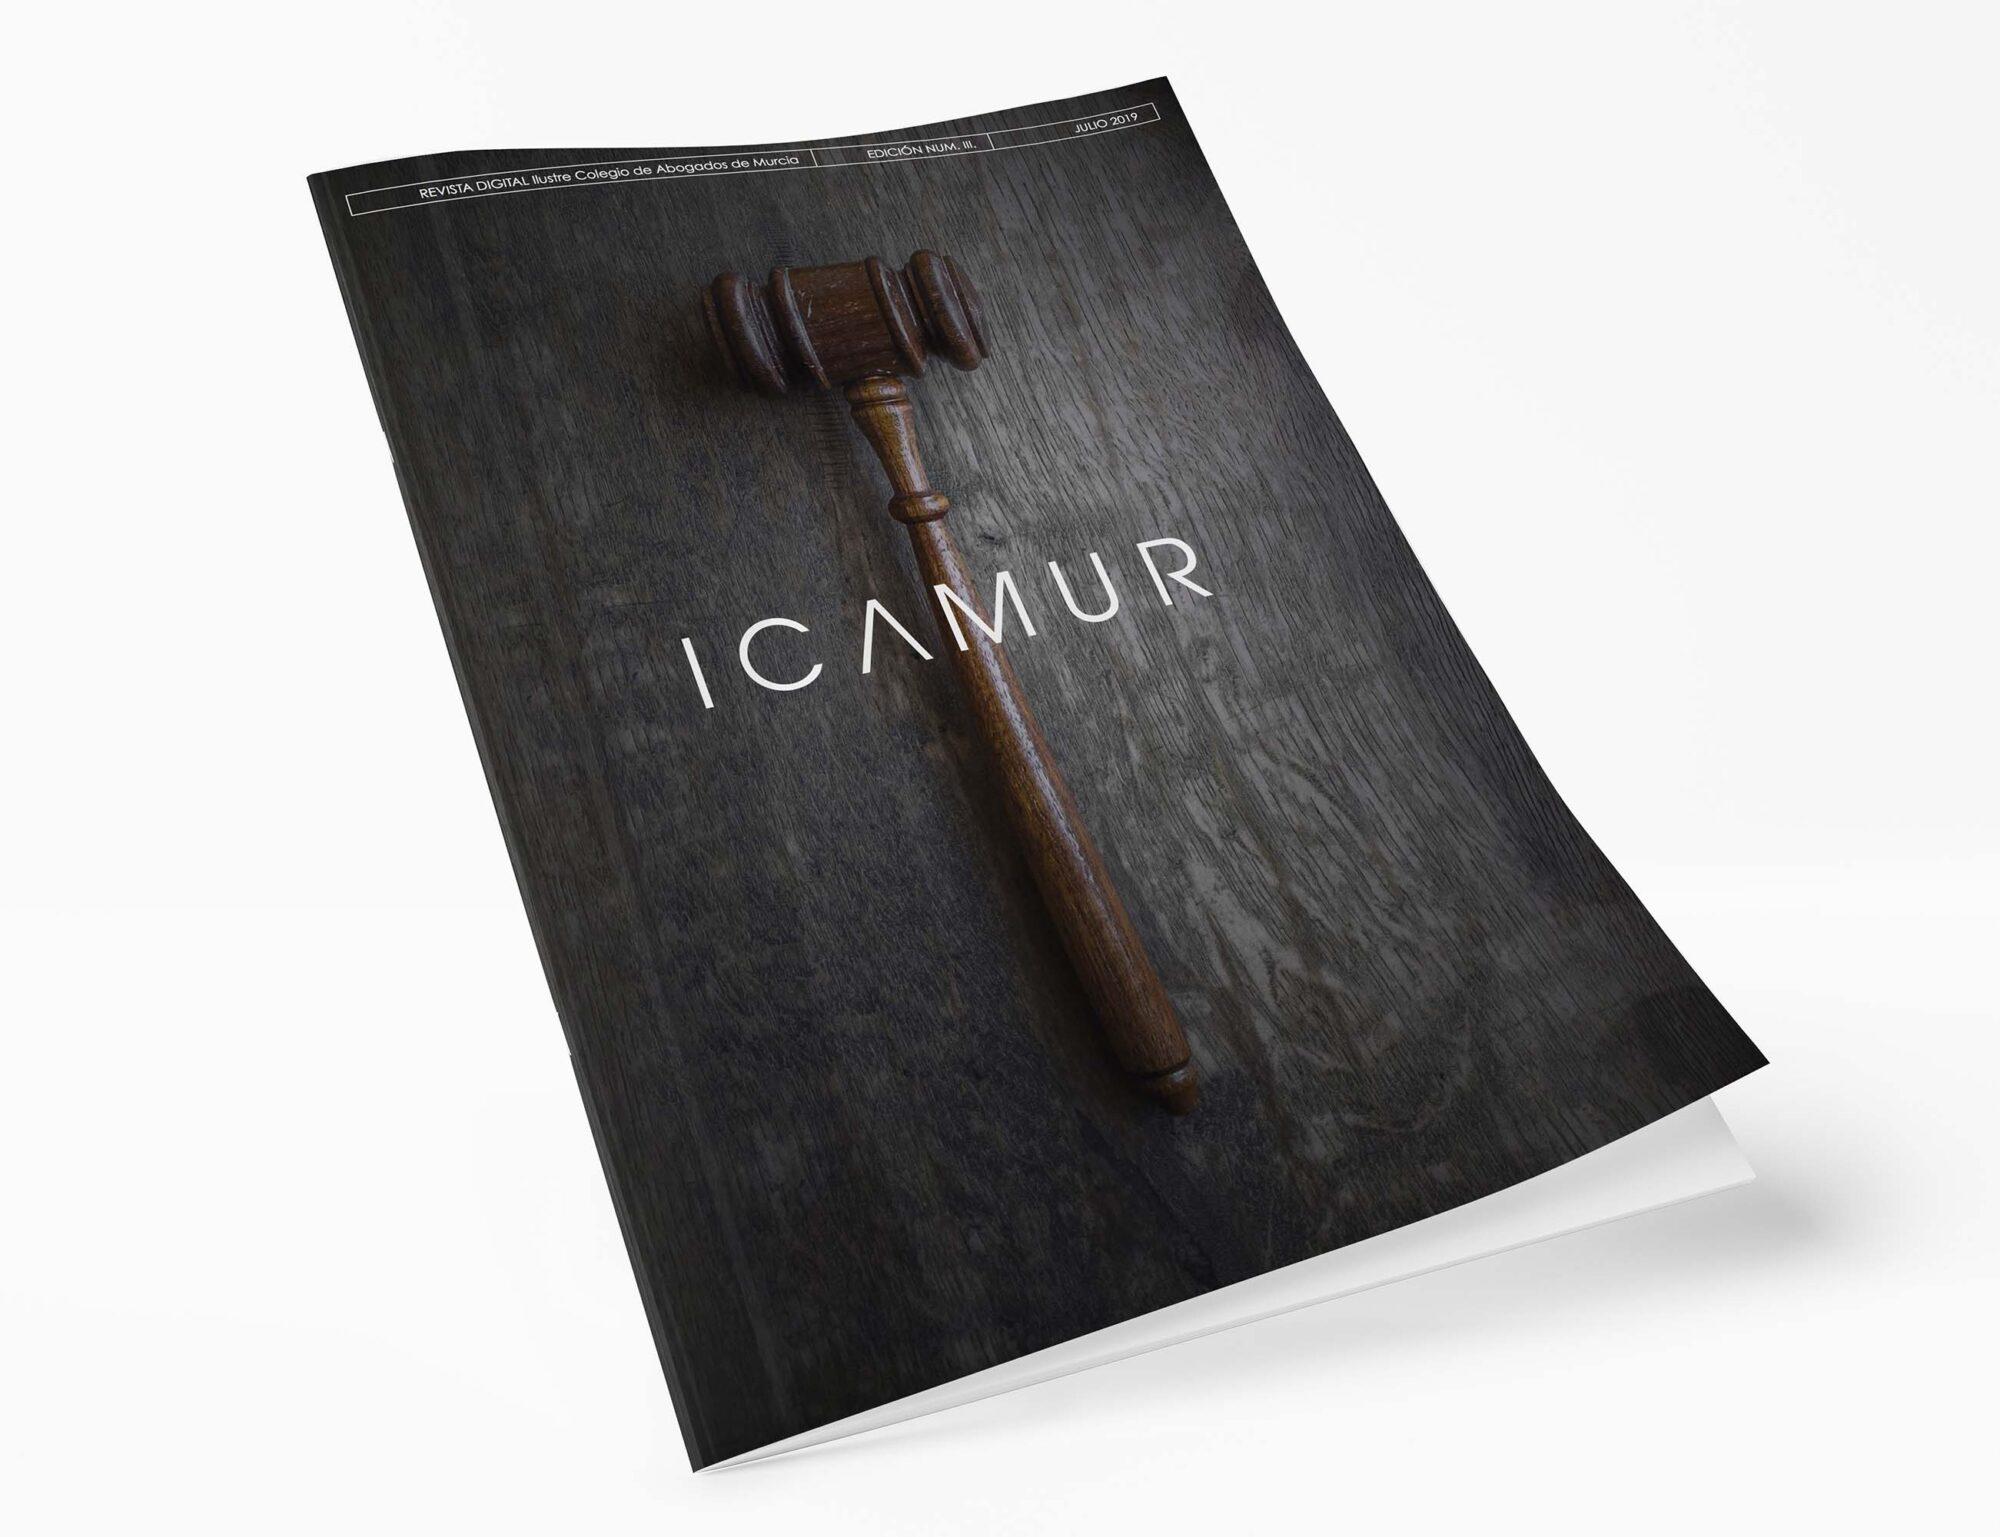 ICAMUR